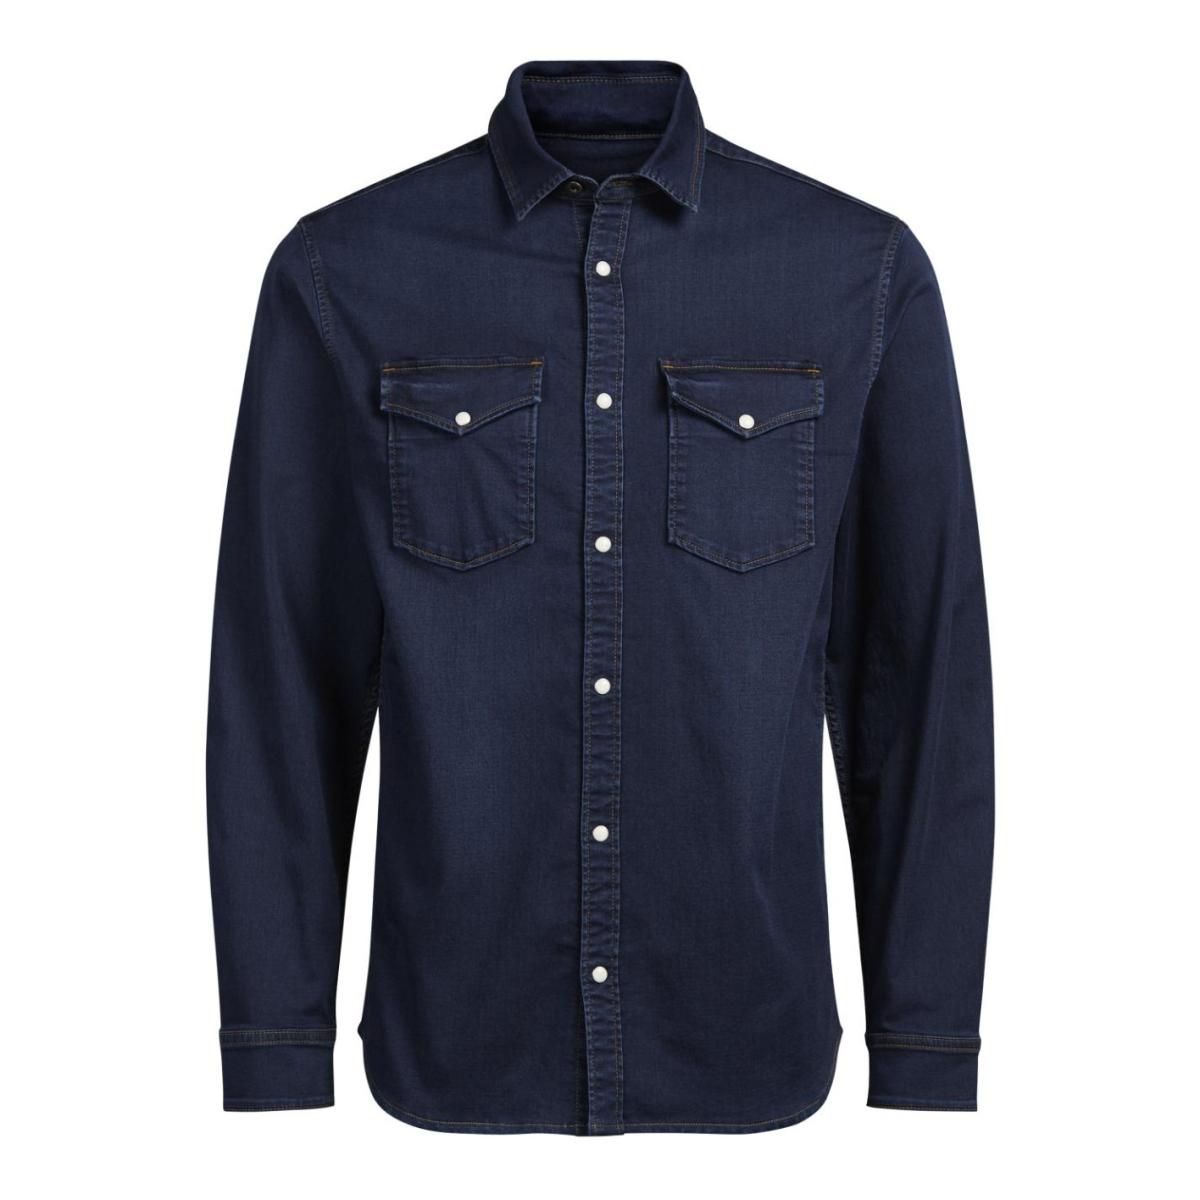 jjiethan jjshirt akm 531 indigo knit 12126734 jack & jones overhemd blue denim